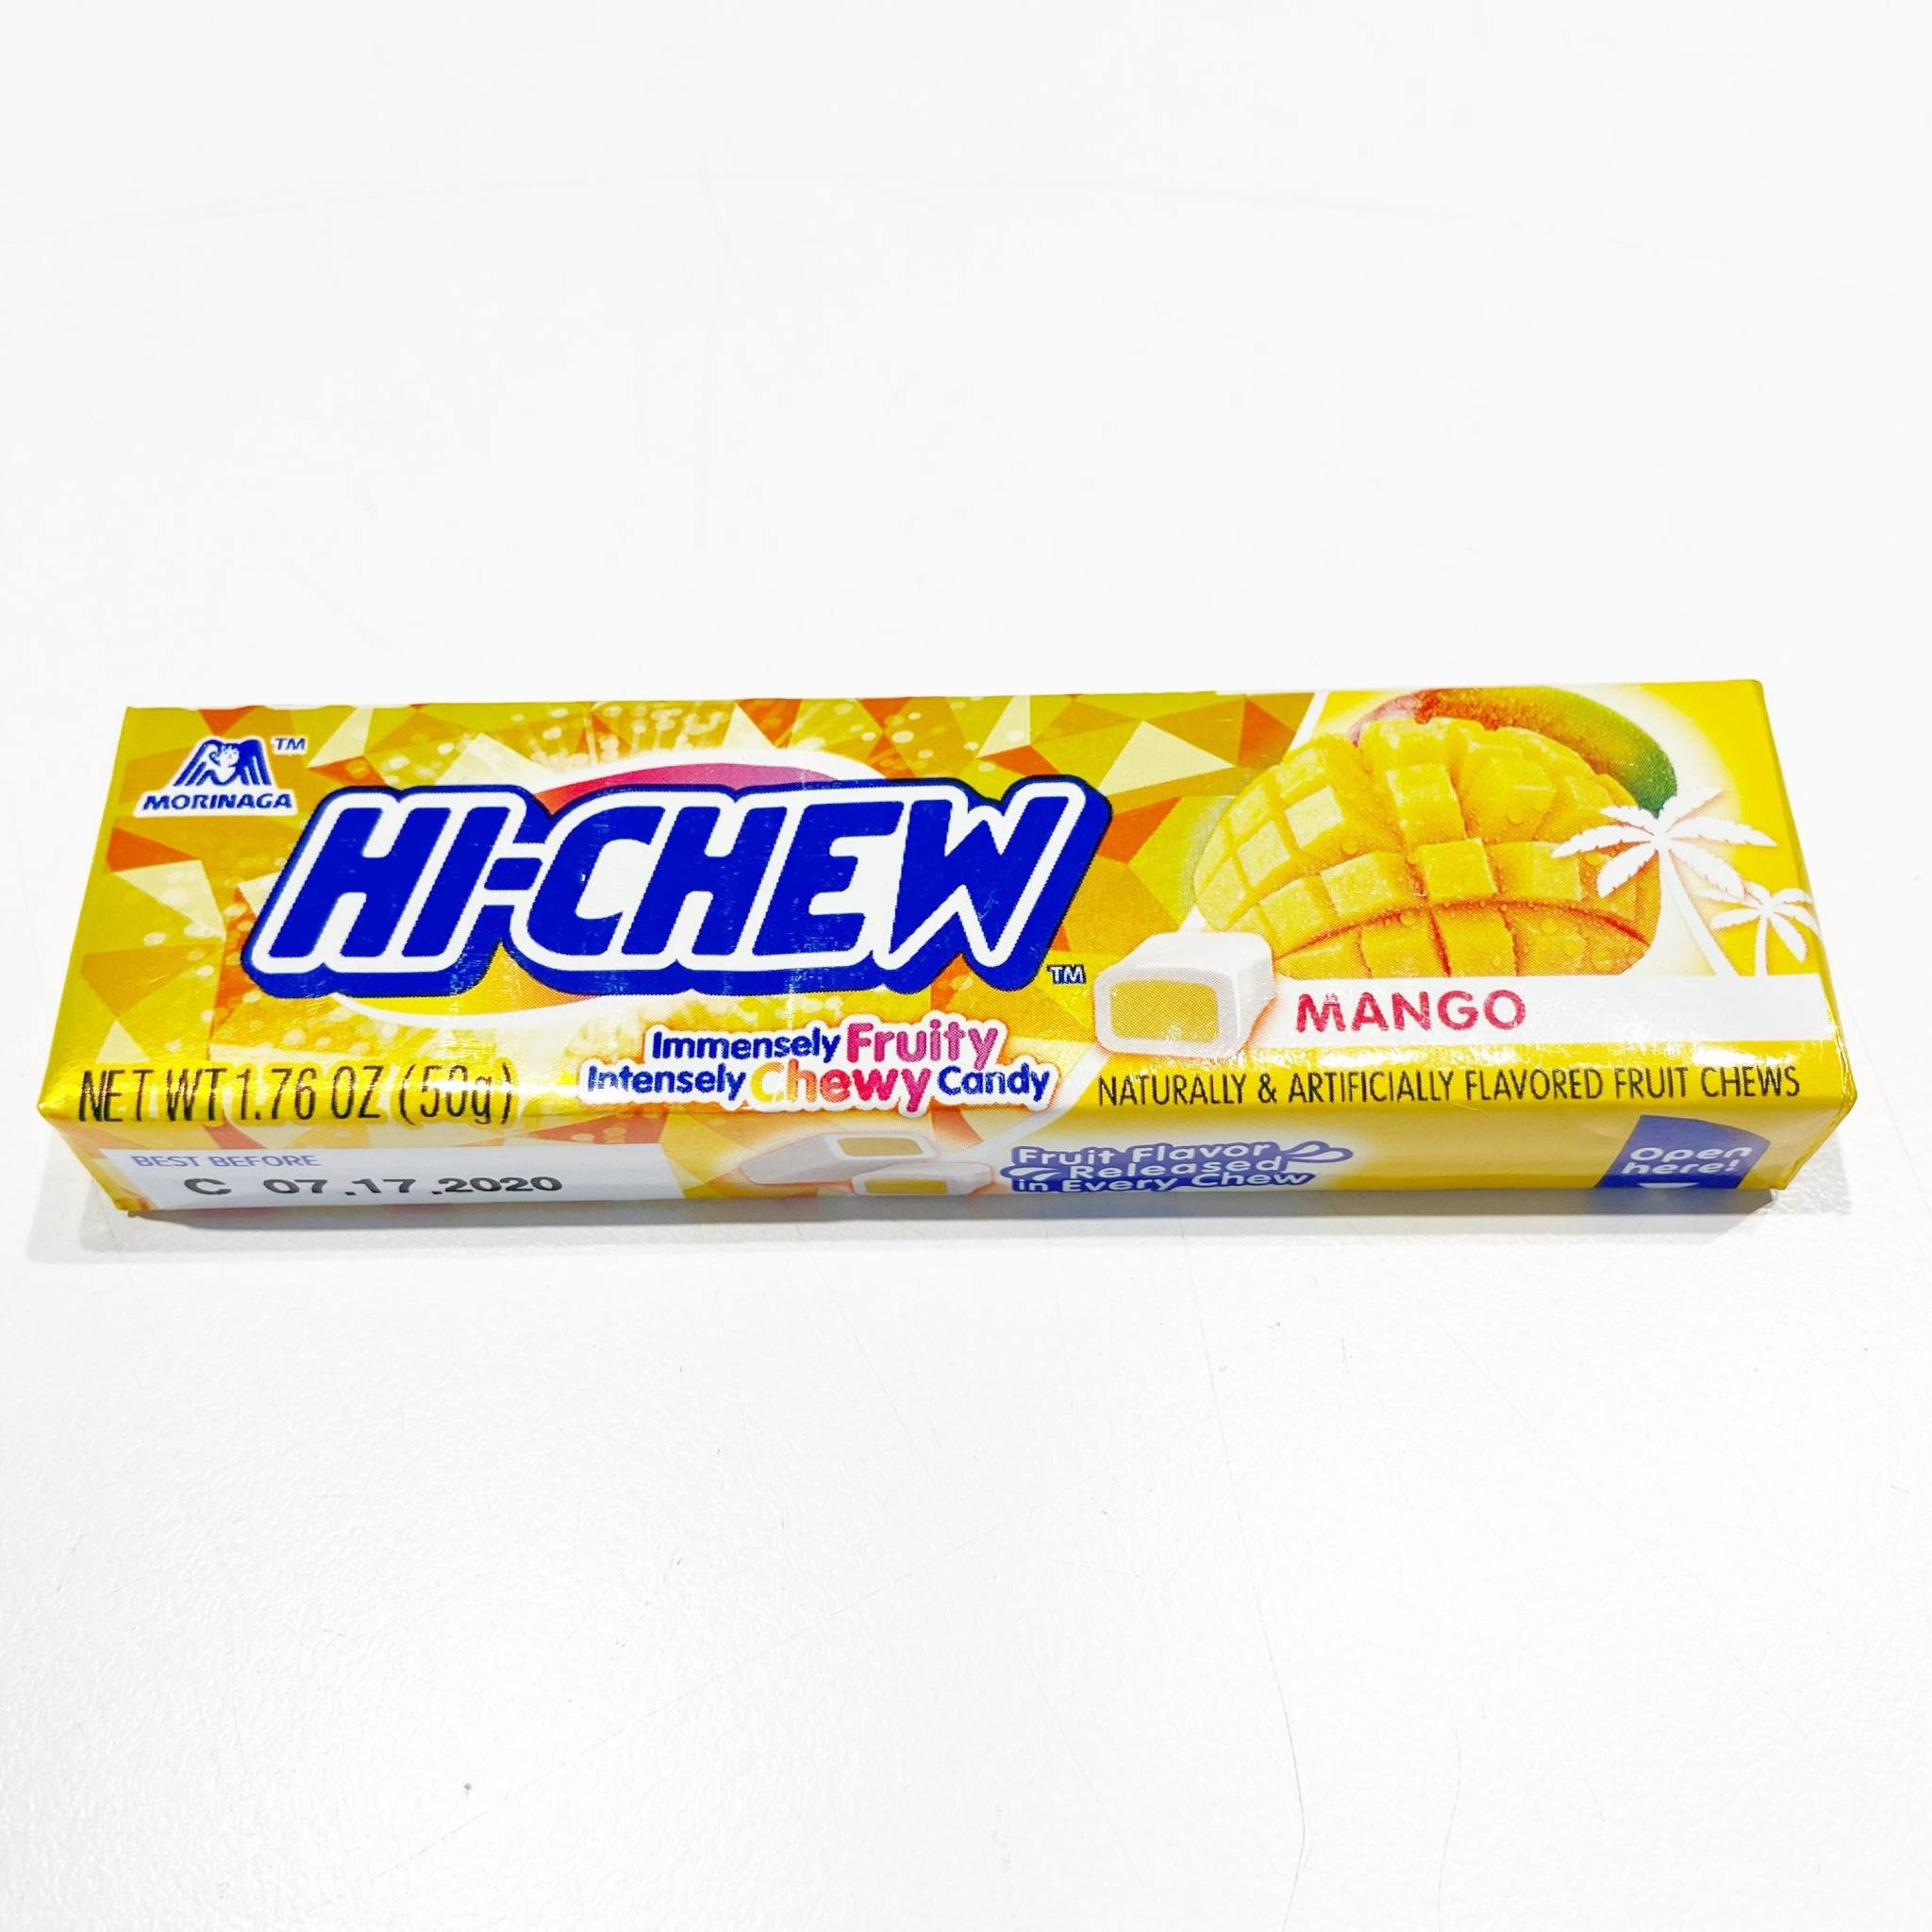 Moringa Hi-Chew Mango 2oz